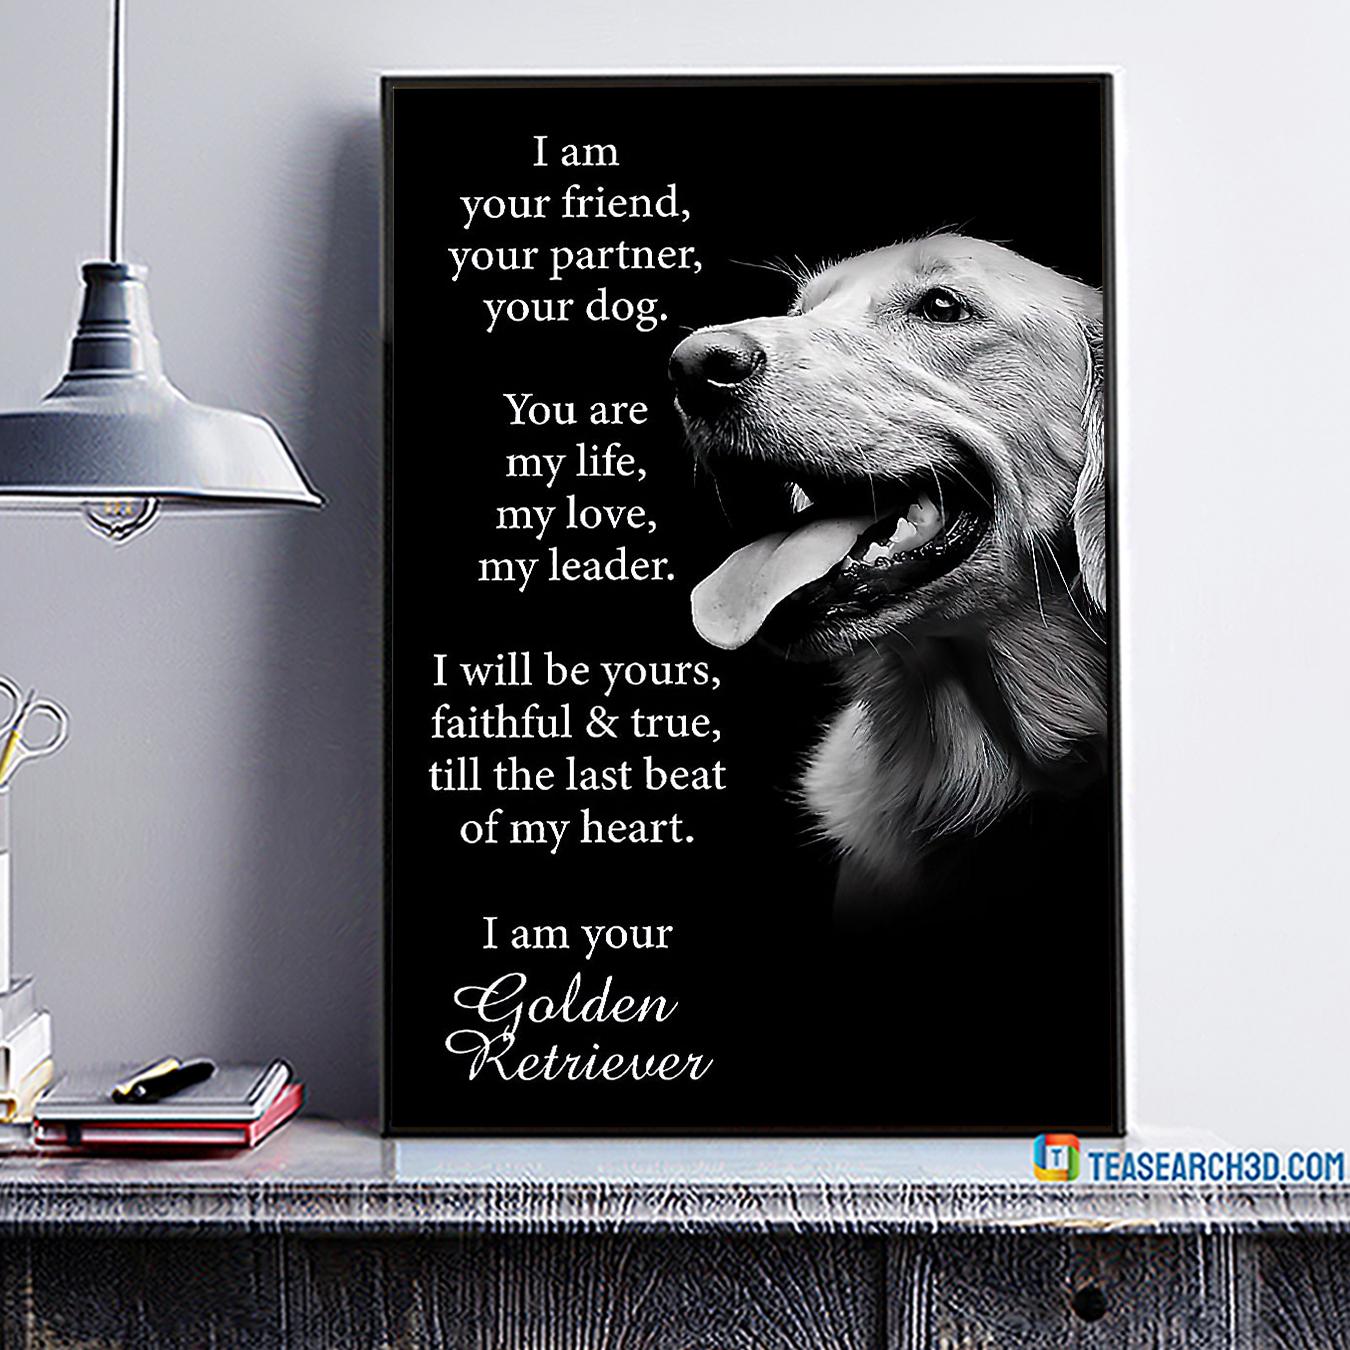 Golden retriever I am your friend your partner your dog poster A1